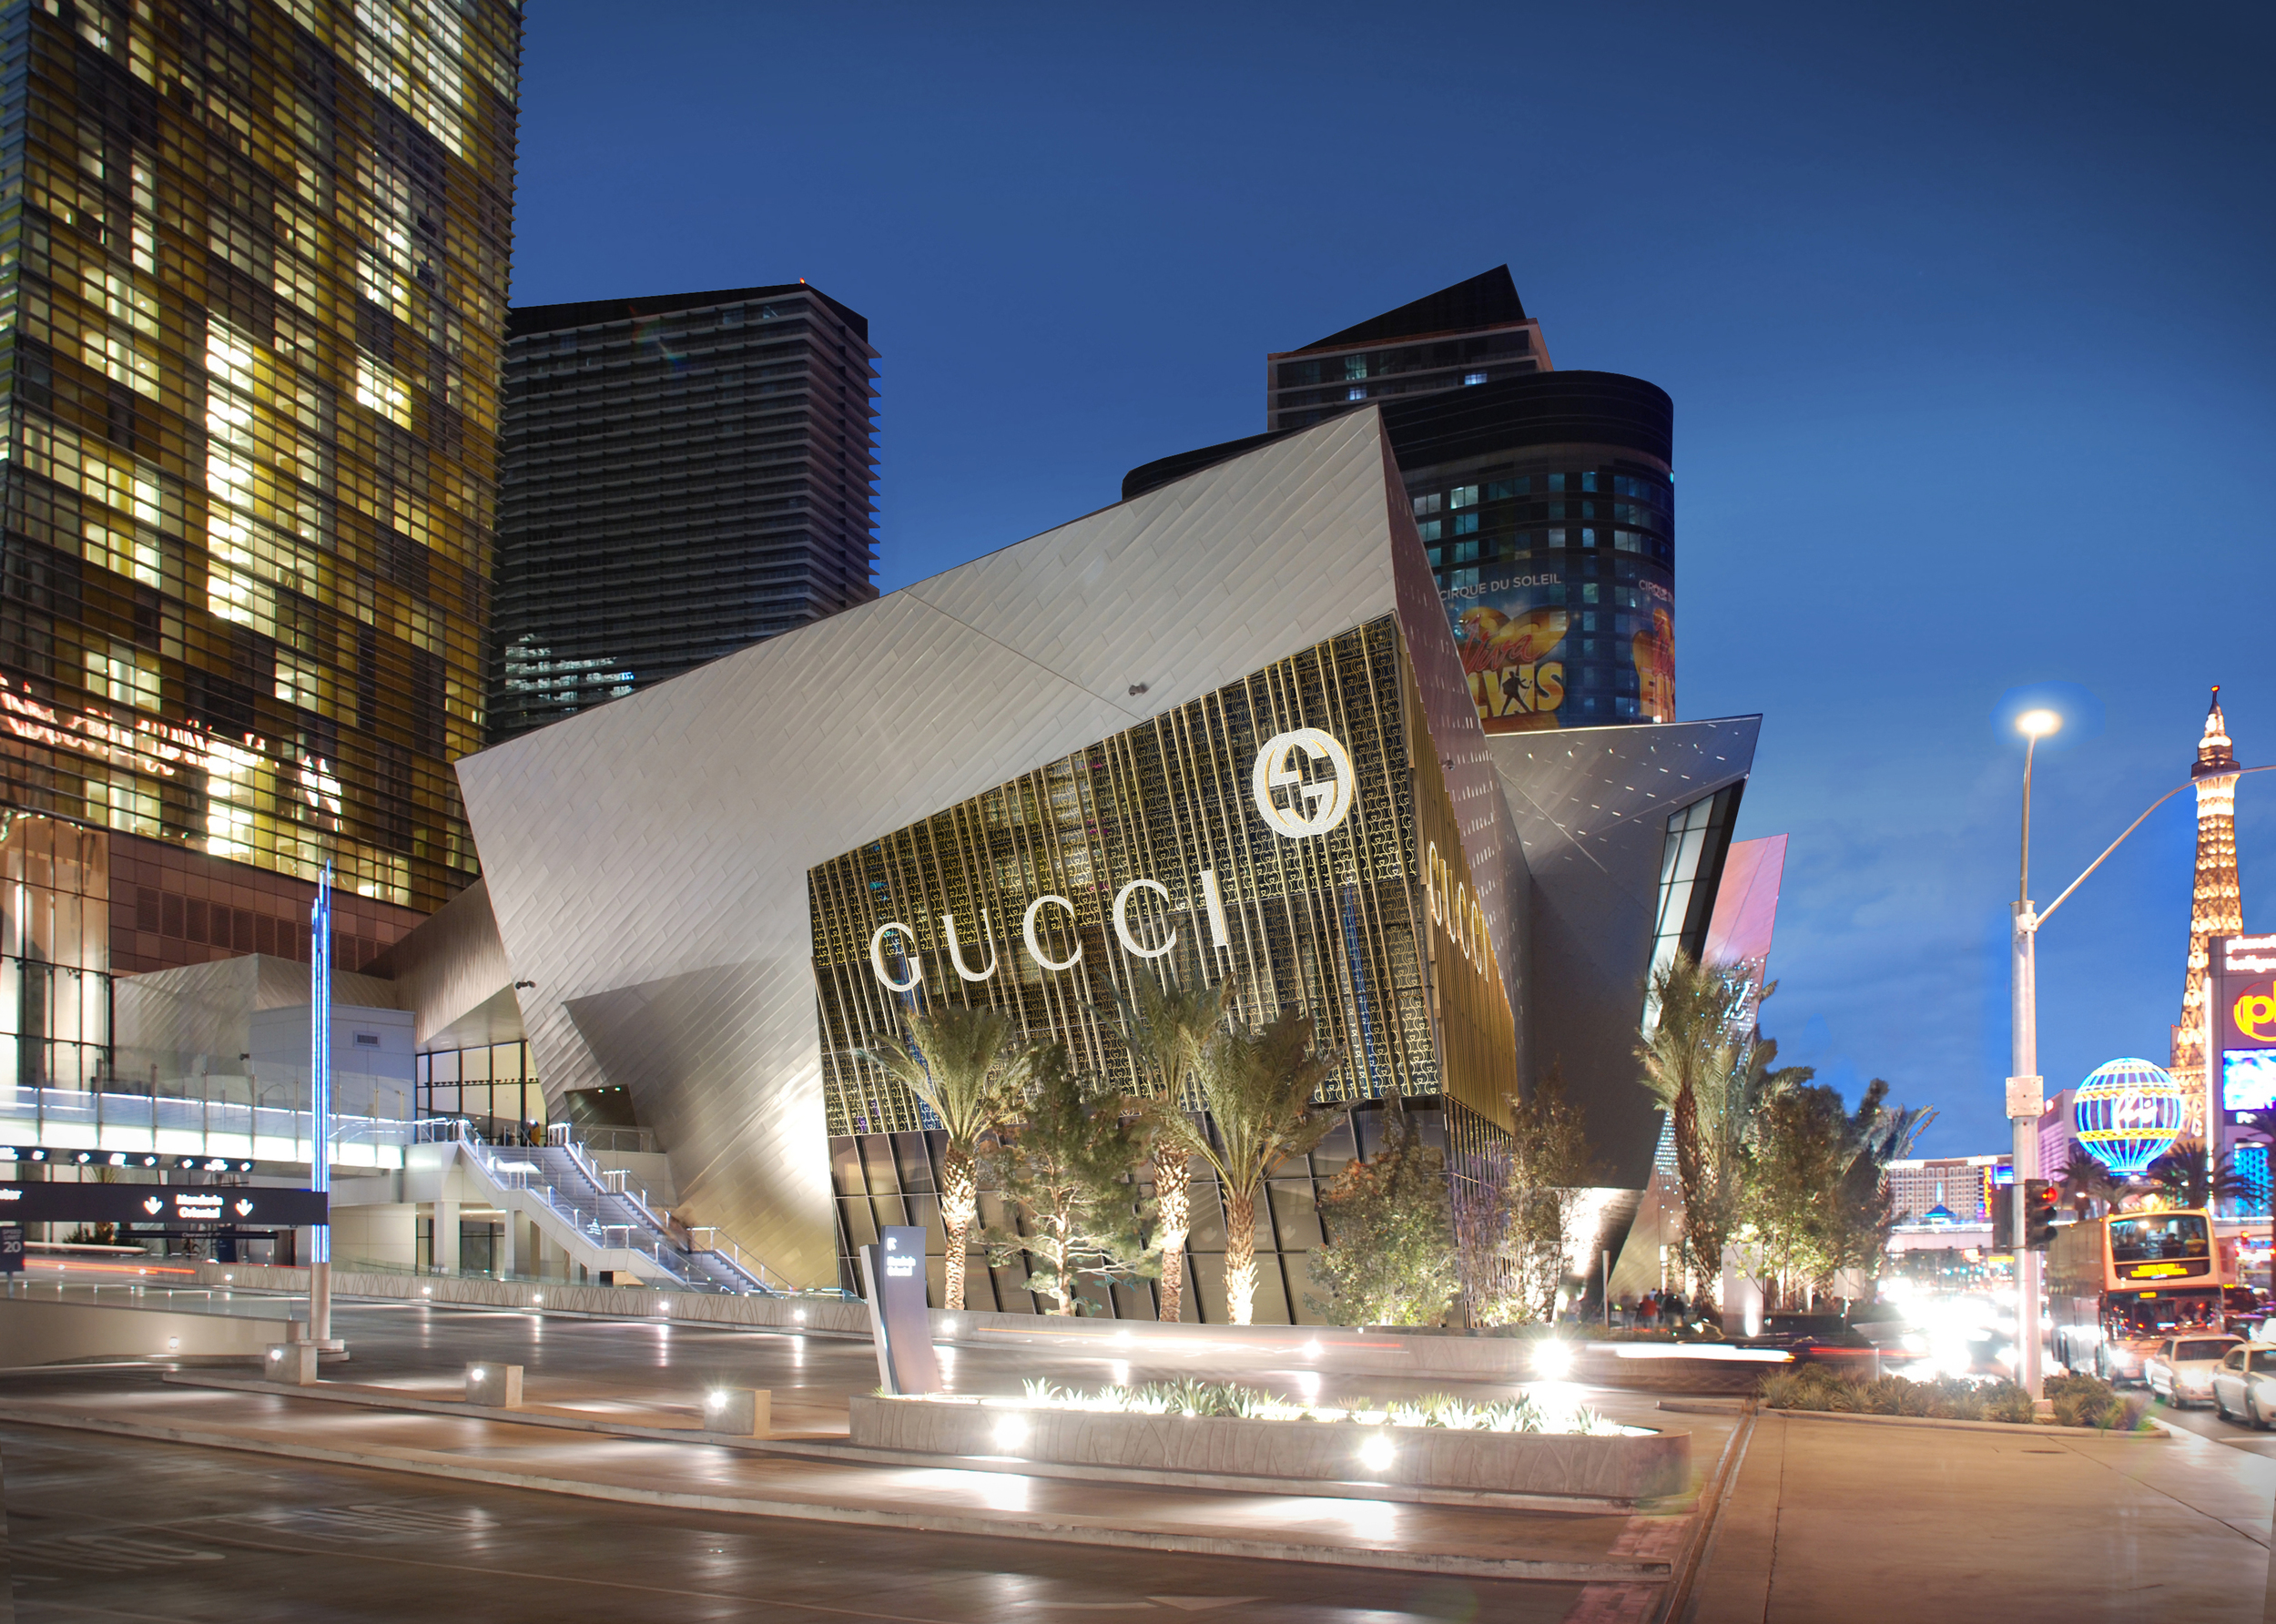 Gucci City Center Las Vegas Exterior Photo-Composite Rendering